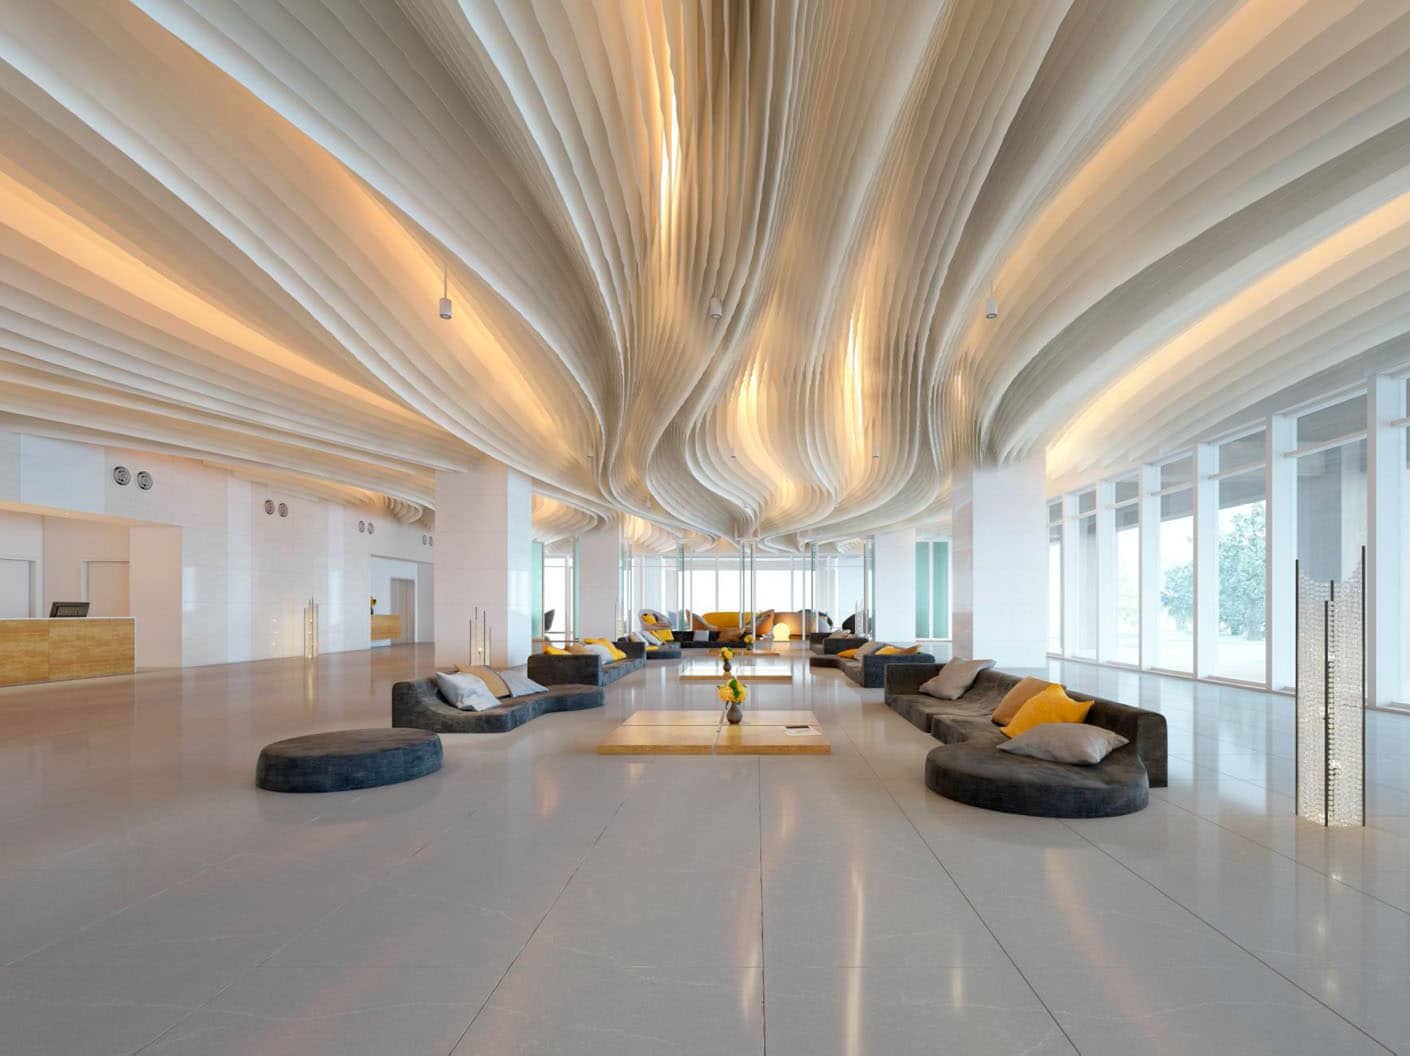 Image of 5 10 in Silestone   Flooring - Cosentino